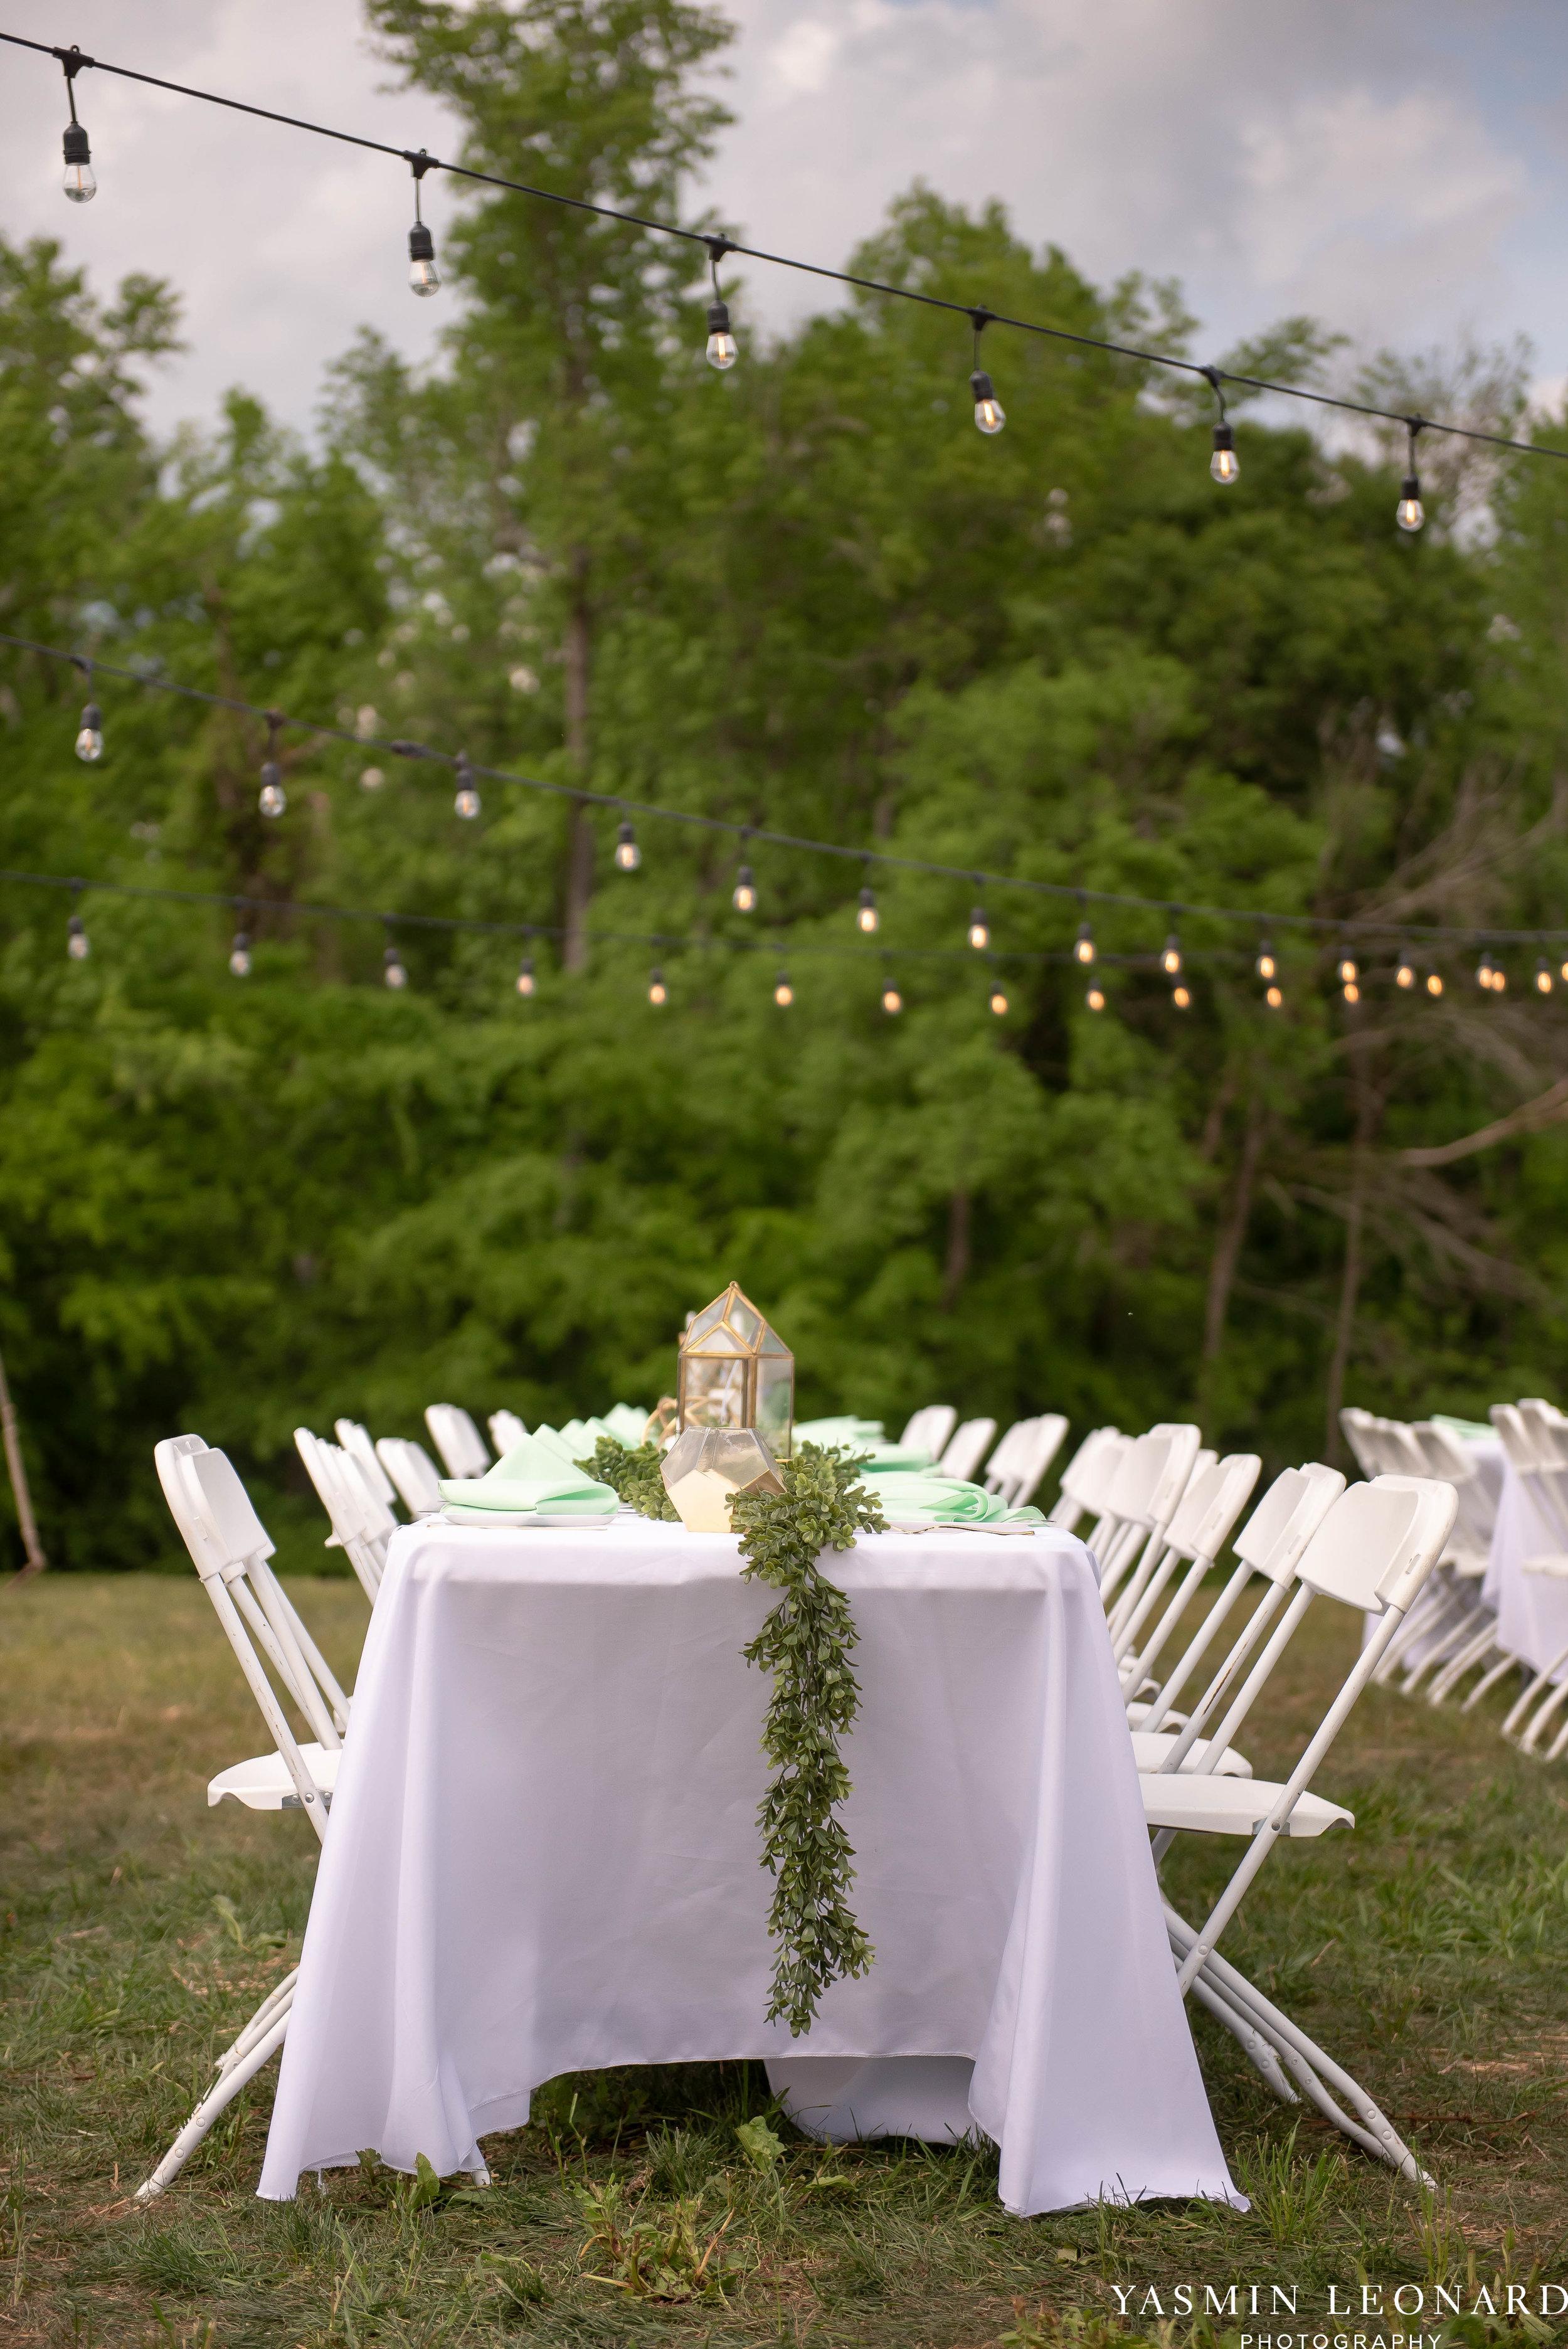 Rain on your wedding day - Rainy Wedding - Plan B for Rain - What to do if it rains on your wedding day - Wedding Inspiration - Outdoor wedding ideas - Rainy Wedding Pictures - Yasmin Leonard Photography-48.jpg